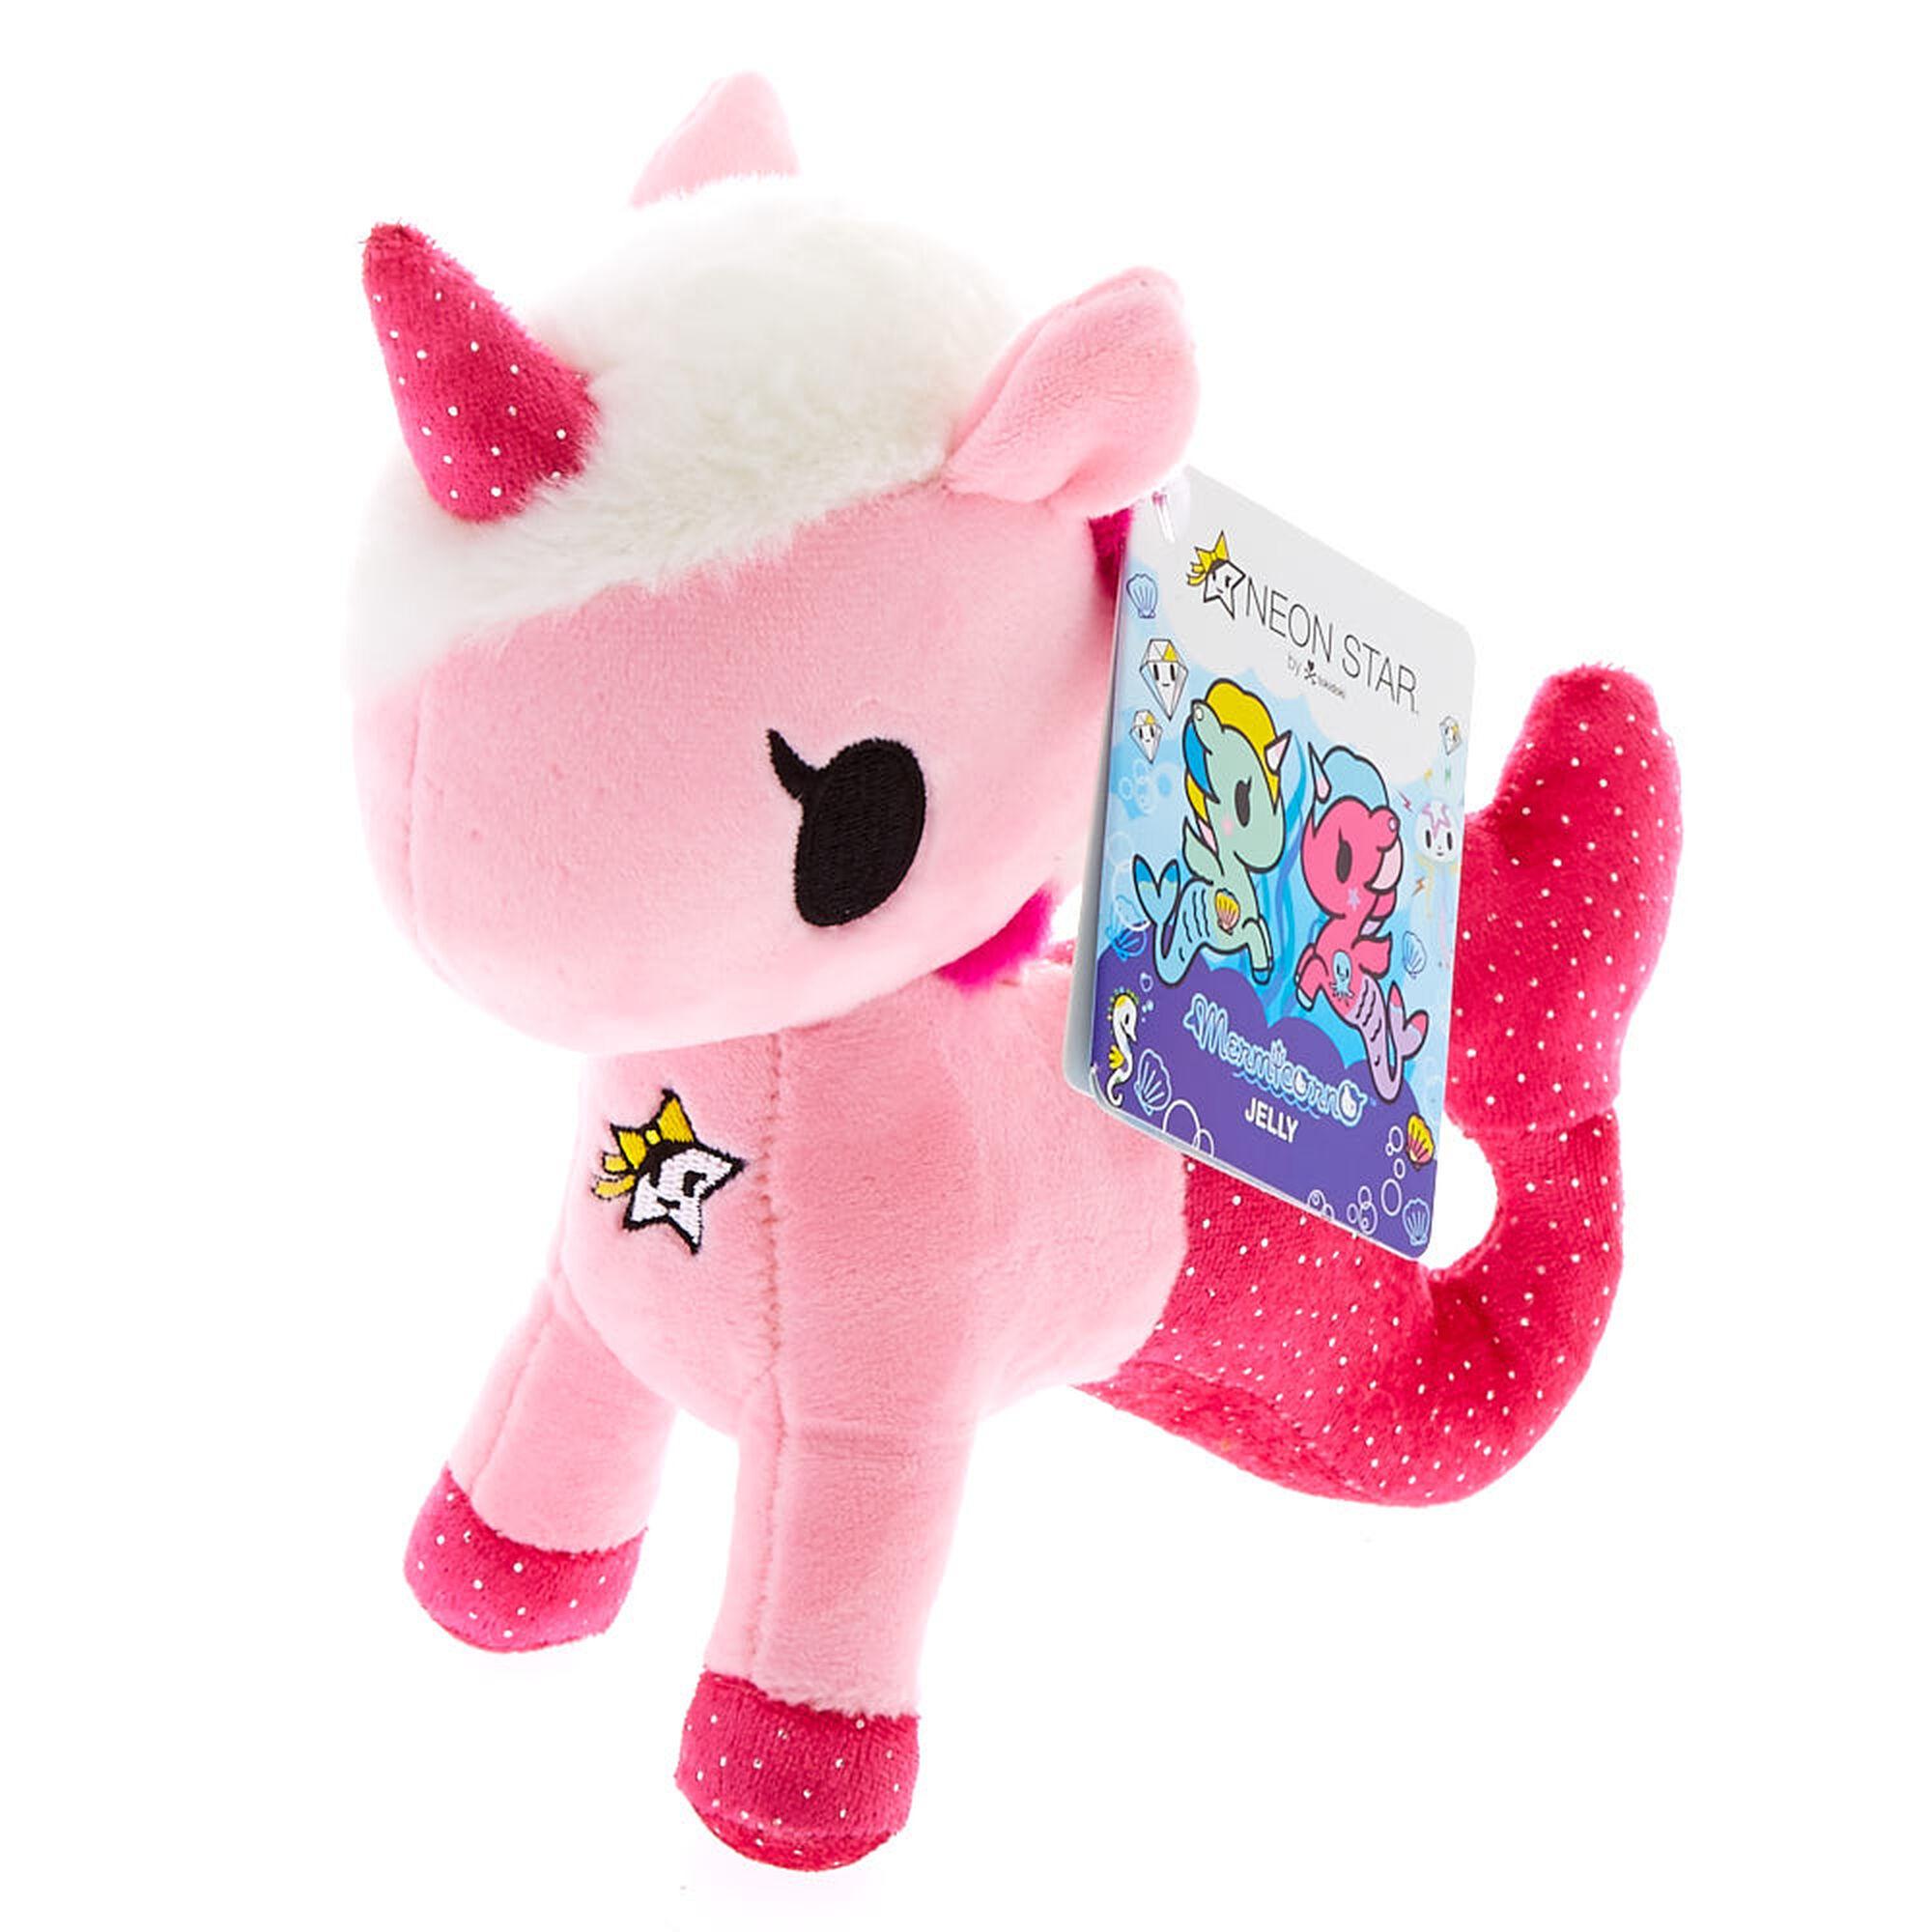 Neon Star By Tokidoki Pink Mermicorno Jelly Plush Toy